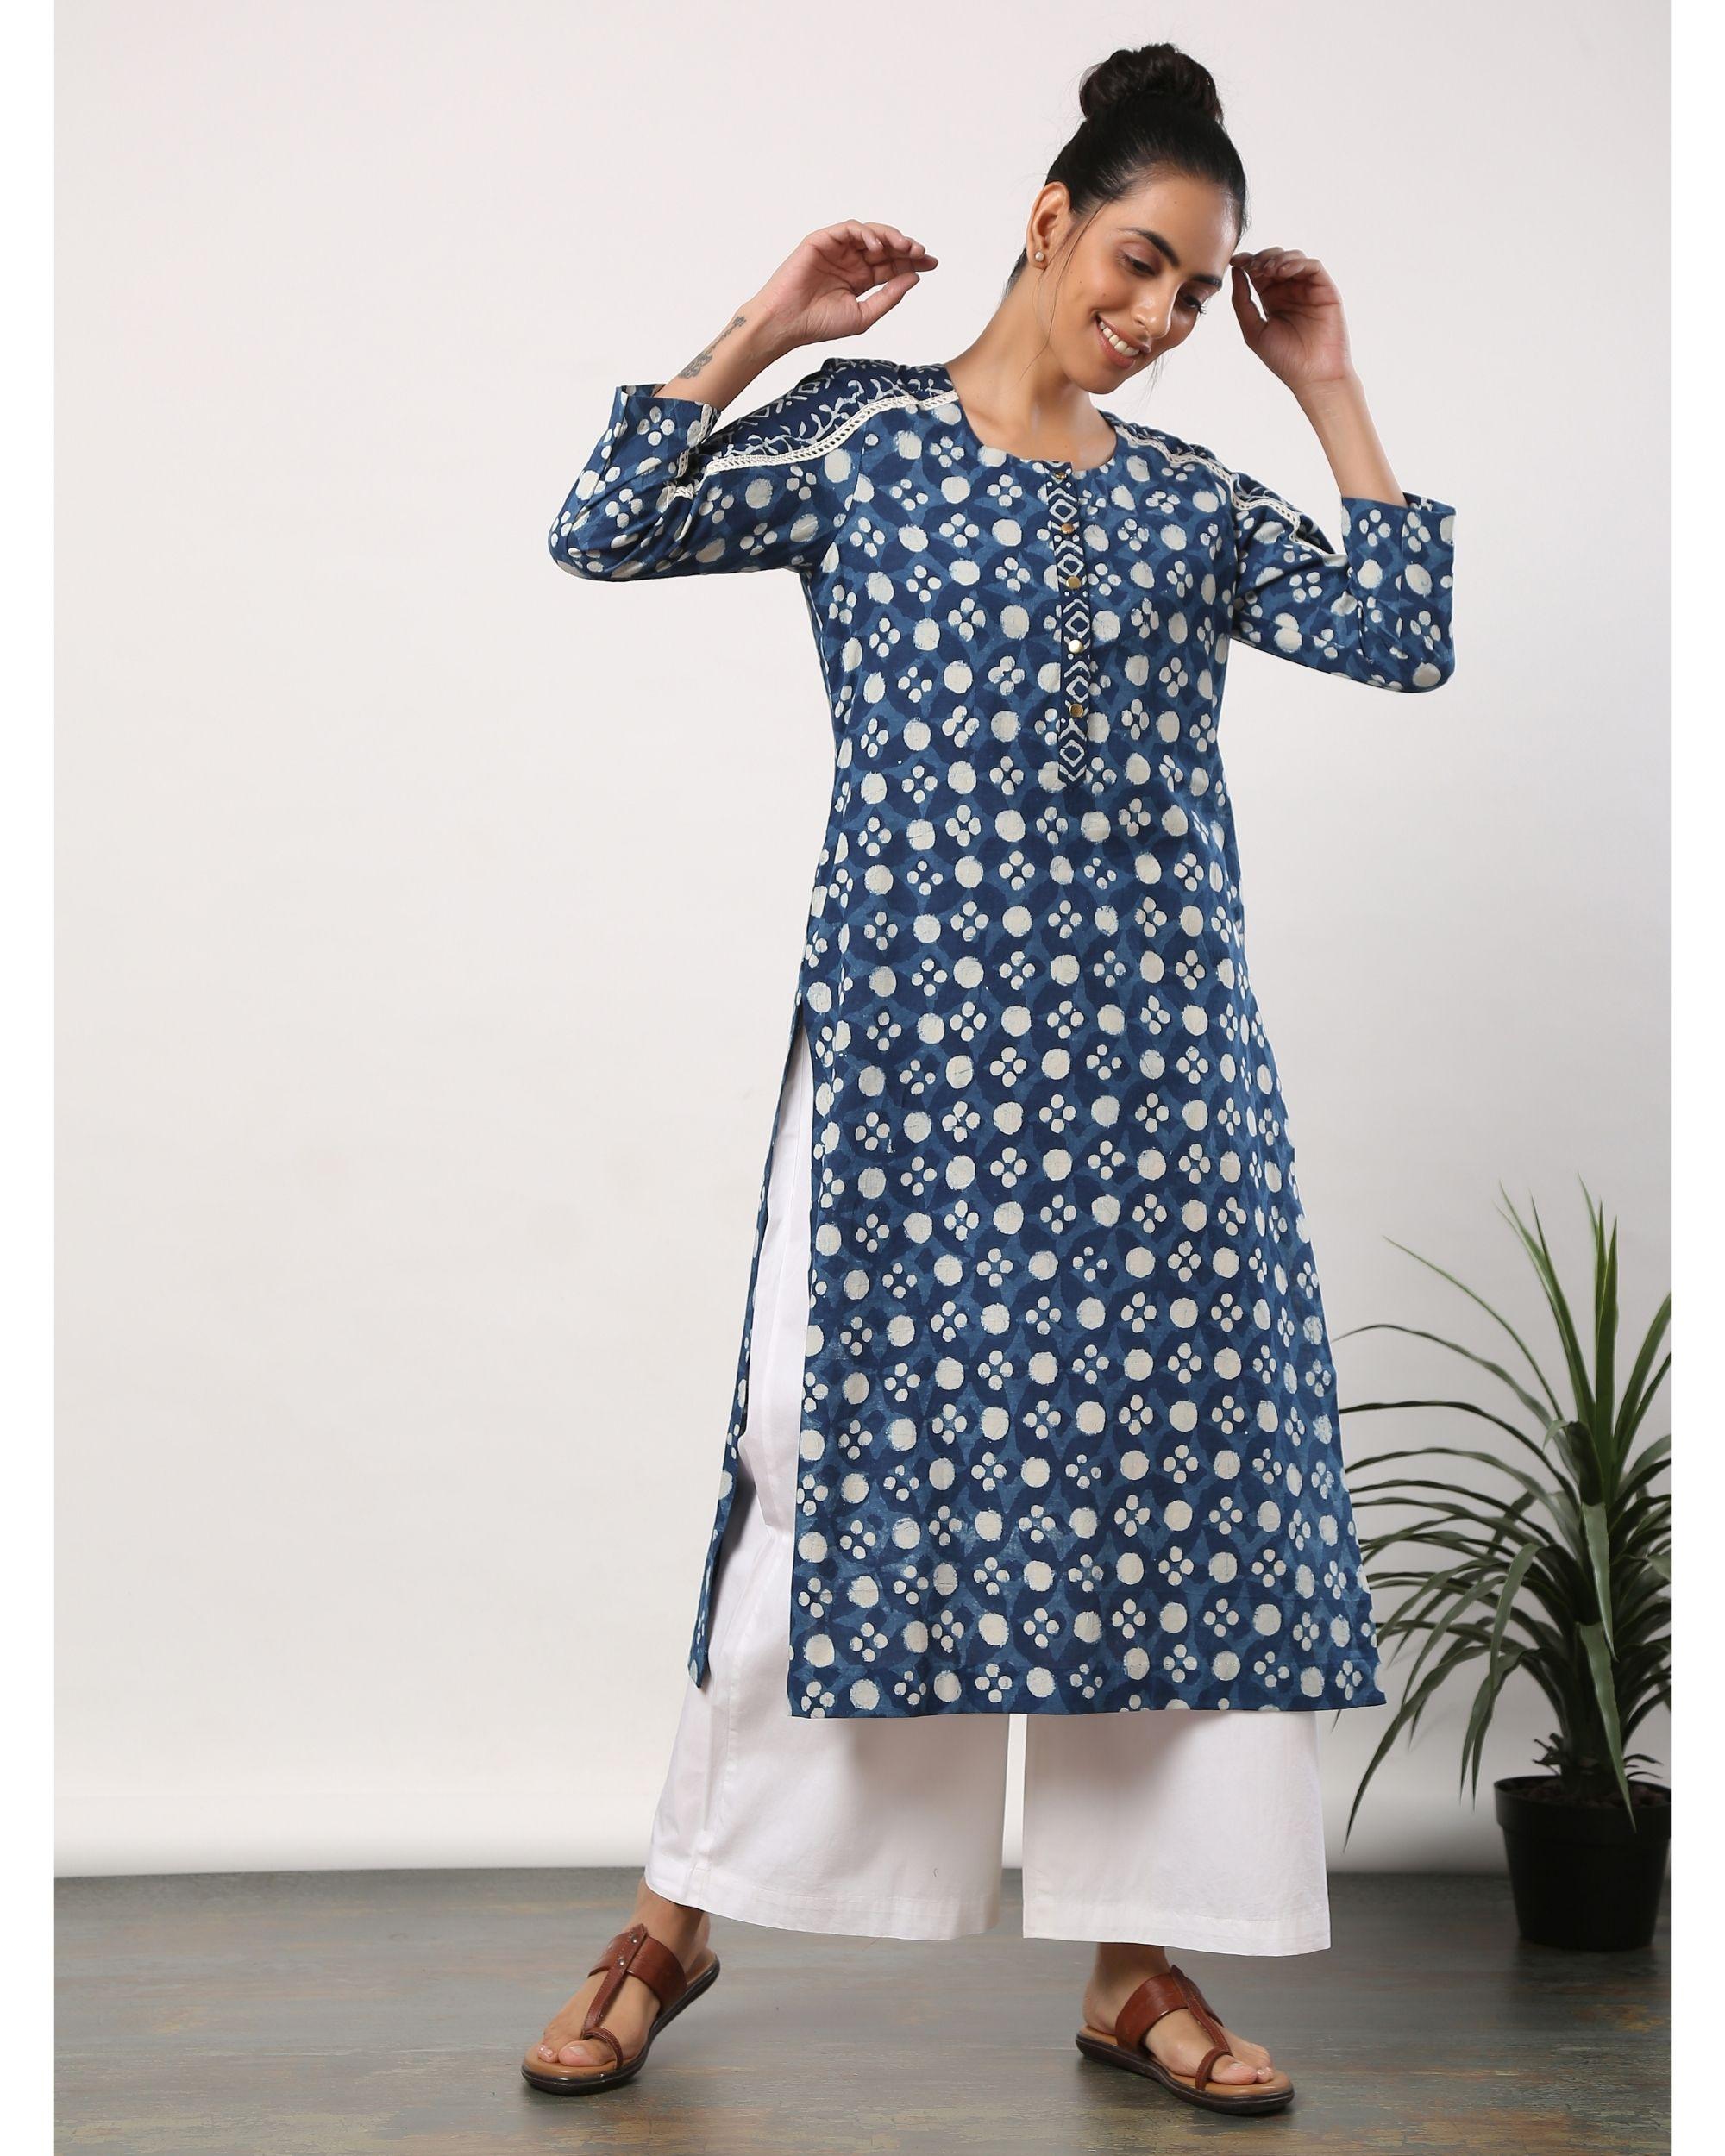 Indigo and white printed lace kurta